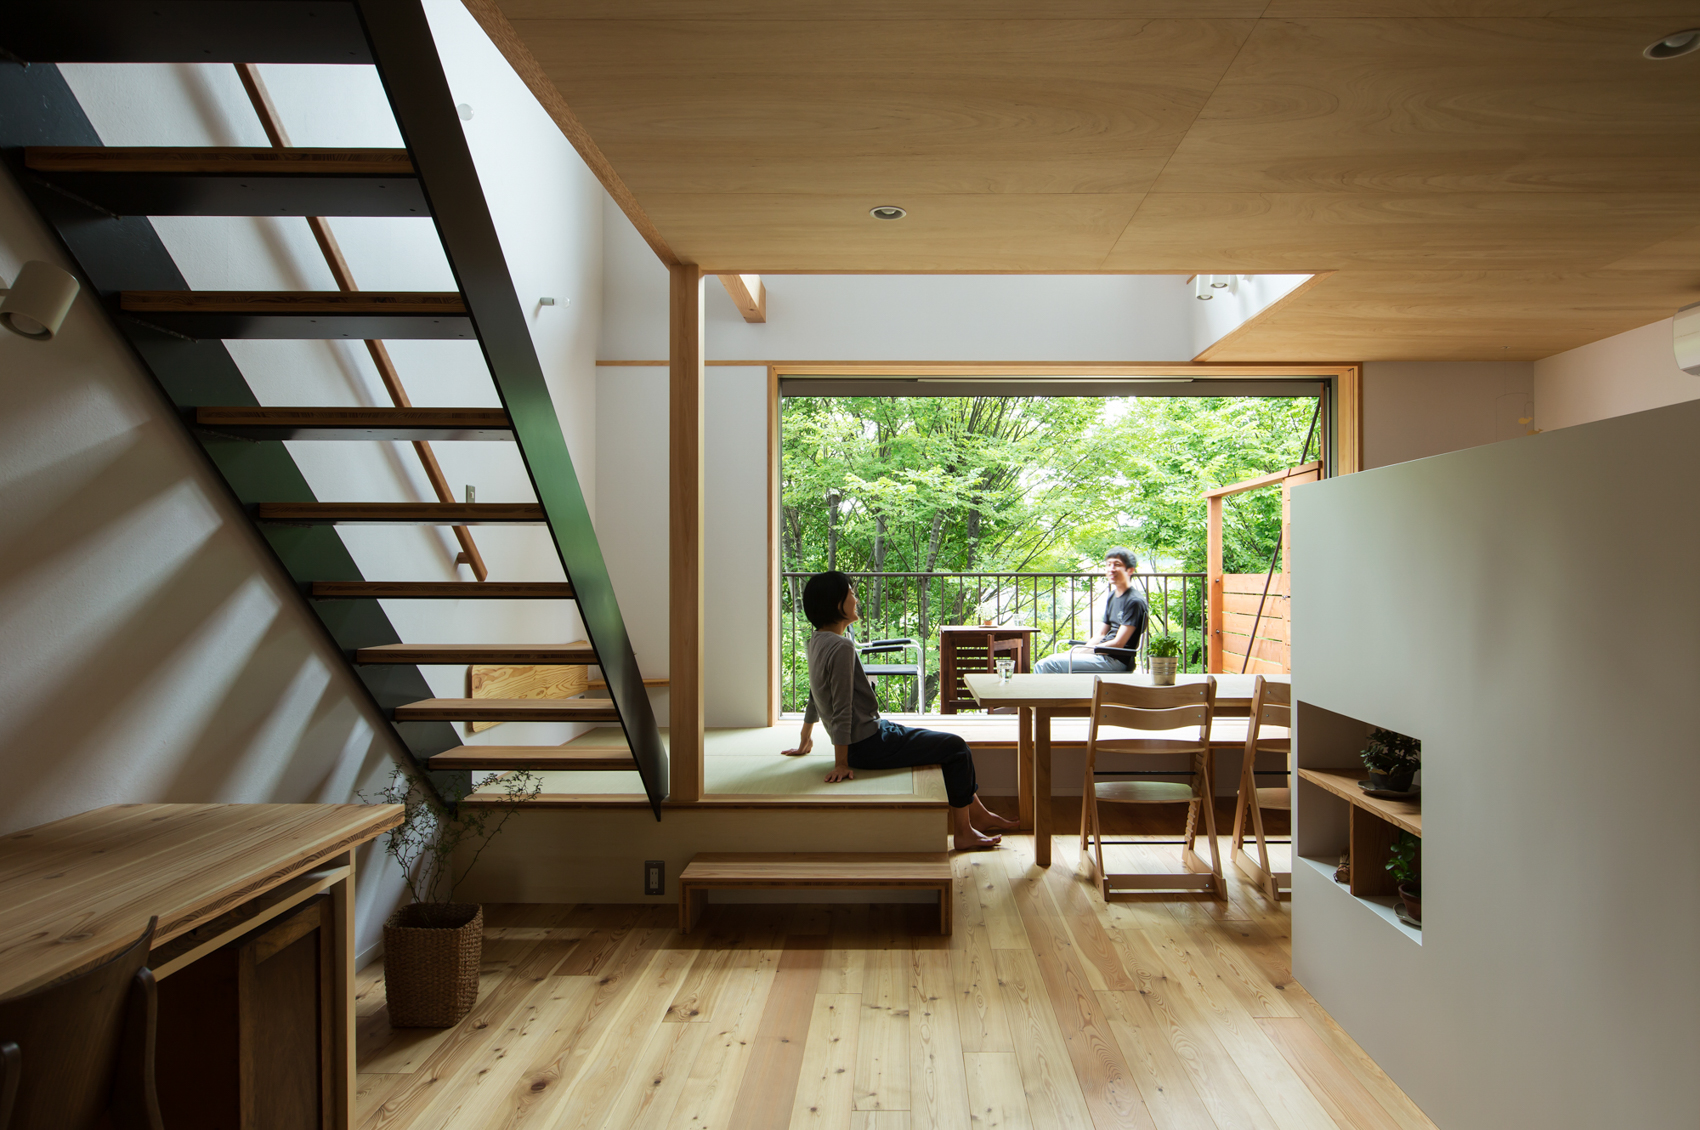 設計:藤森大作建築設計事務所 プロデュース、施工:IFA住宅設計室